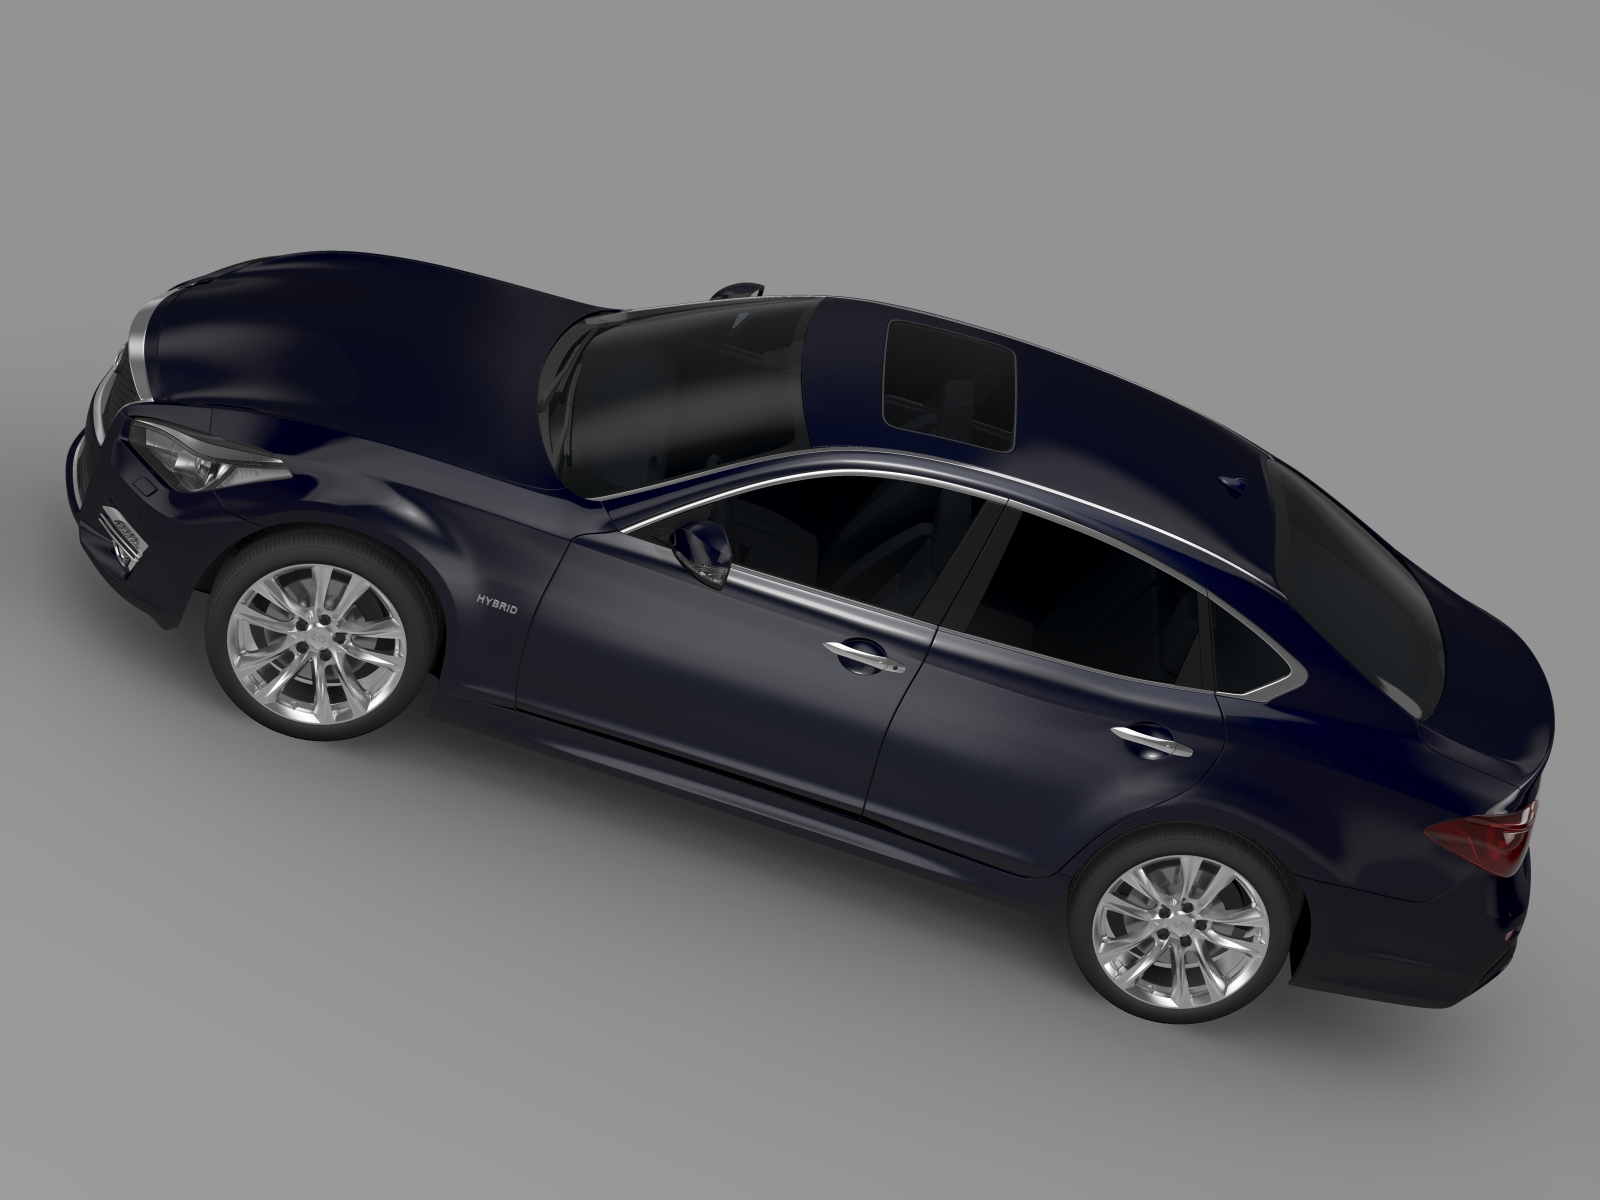 infiniti q70 hybrid y51 2015 3d model flatpyramid. Black Bedroom Furniture Sets. Home Design Ideas